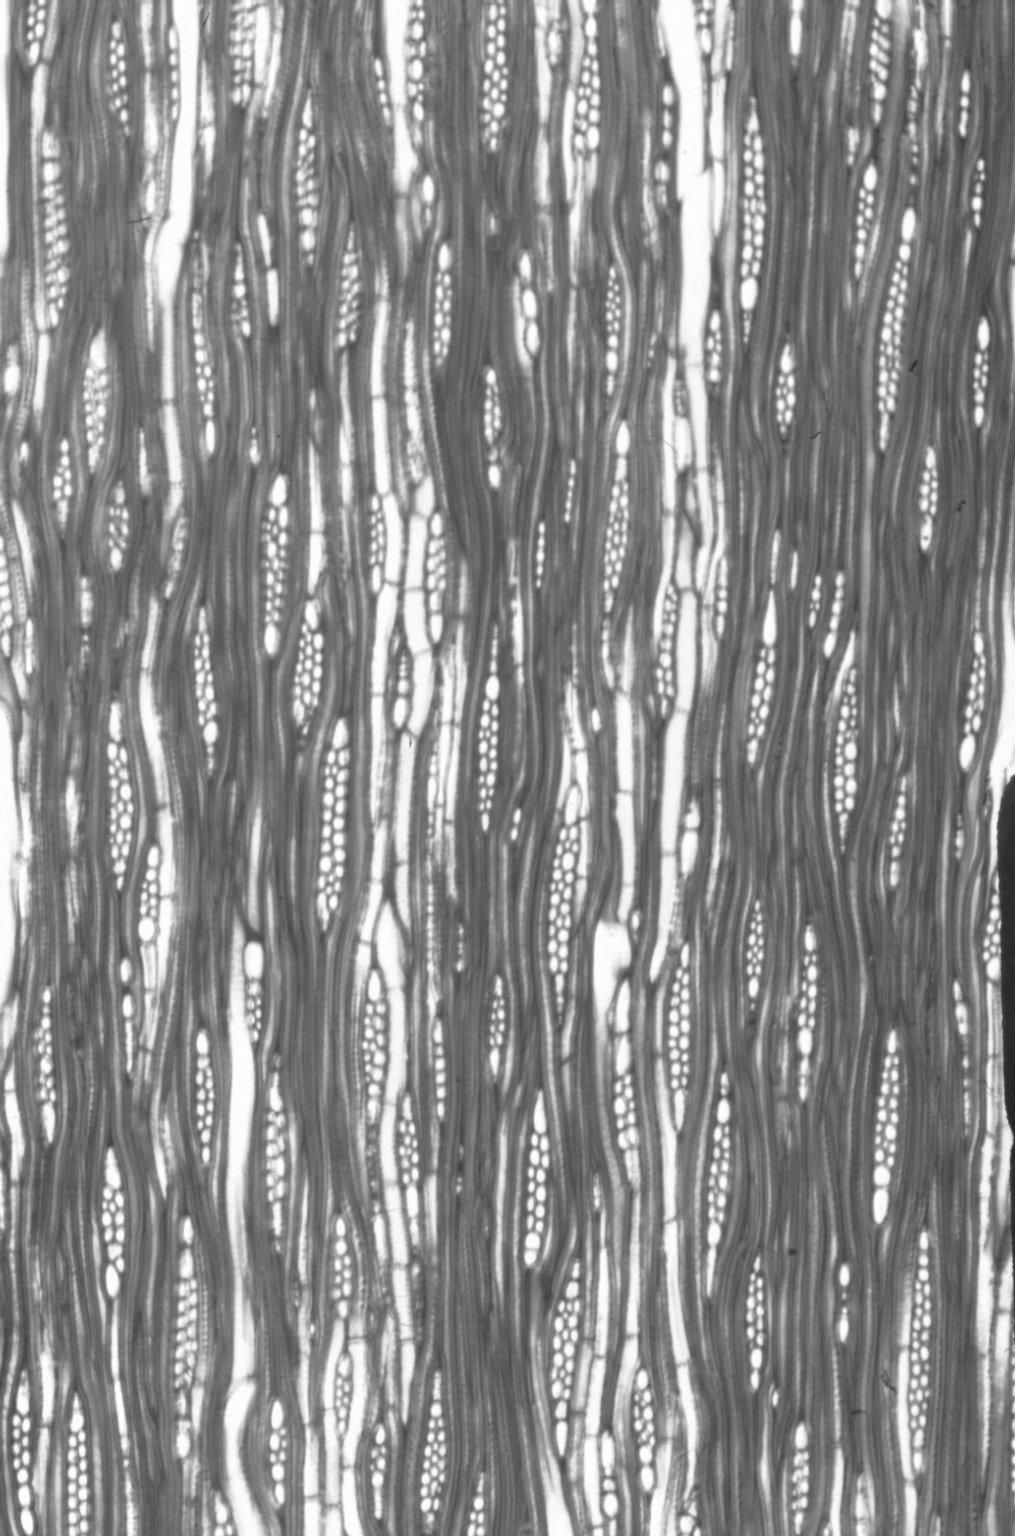 BUXACEAE Buxus sempervirens